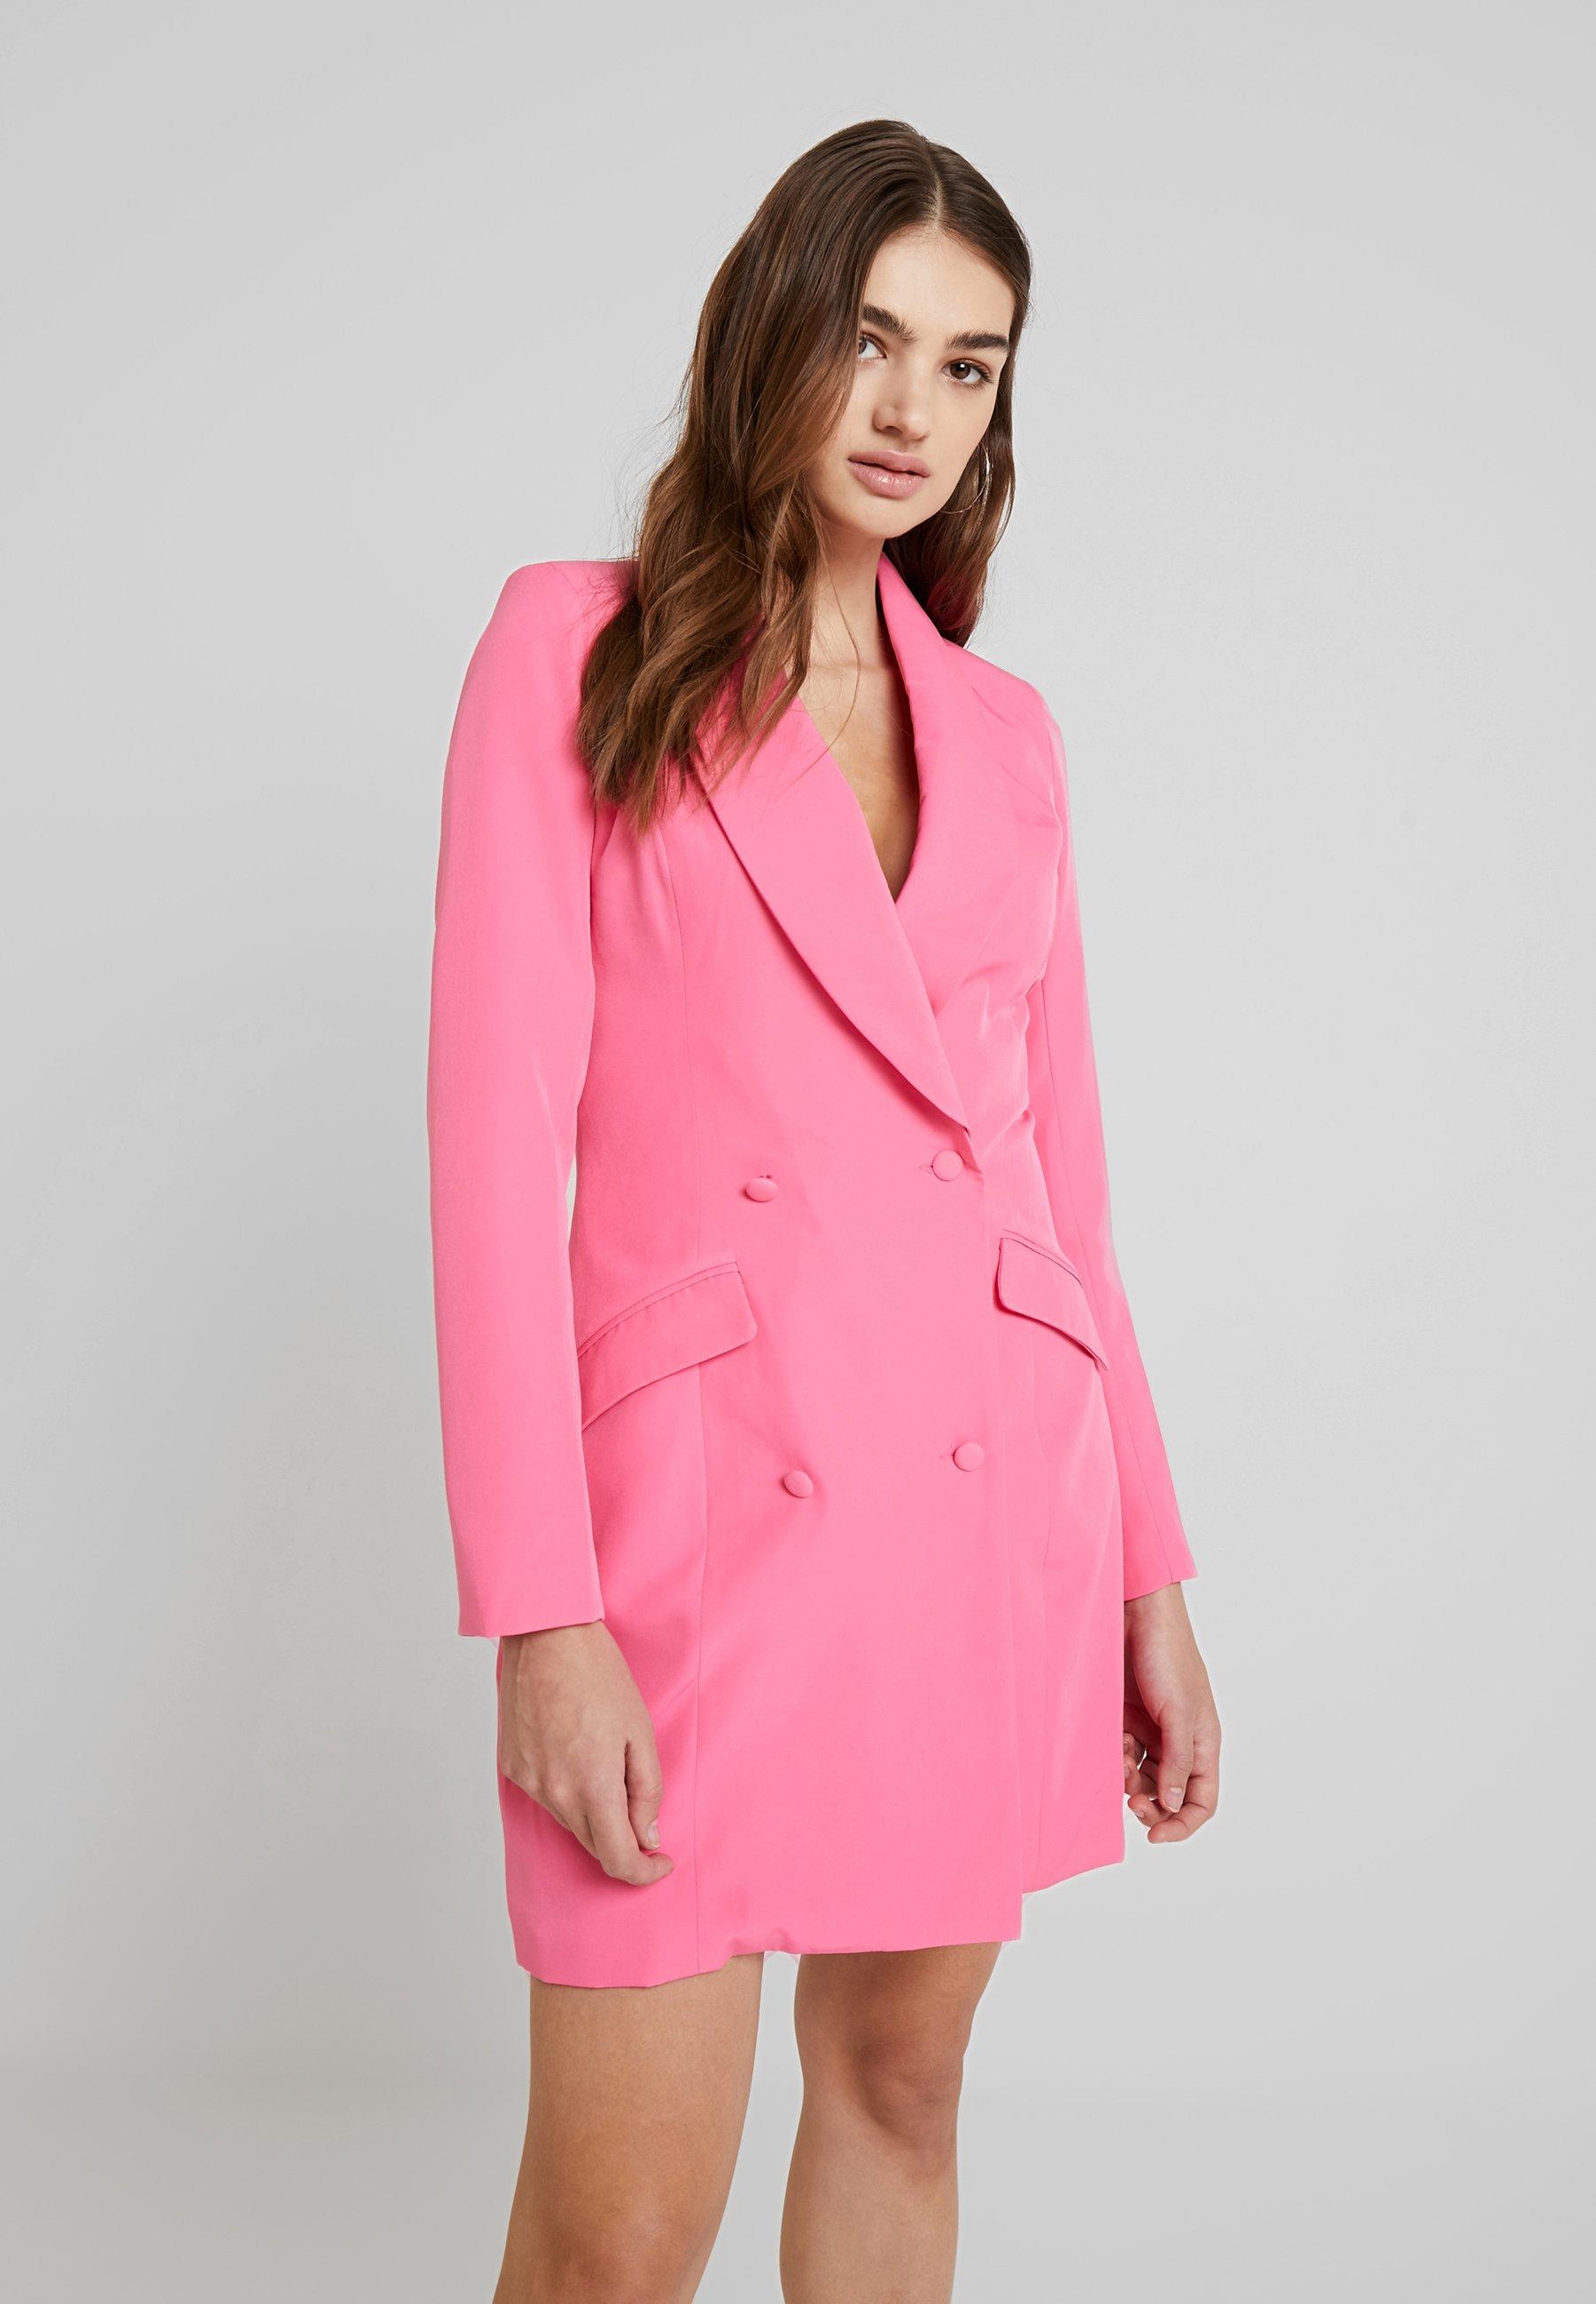 pink blazer dress